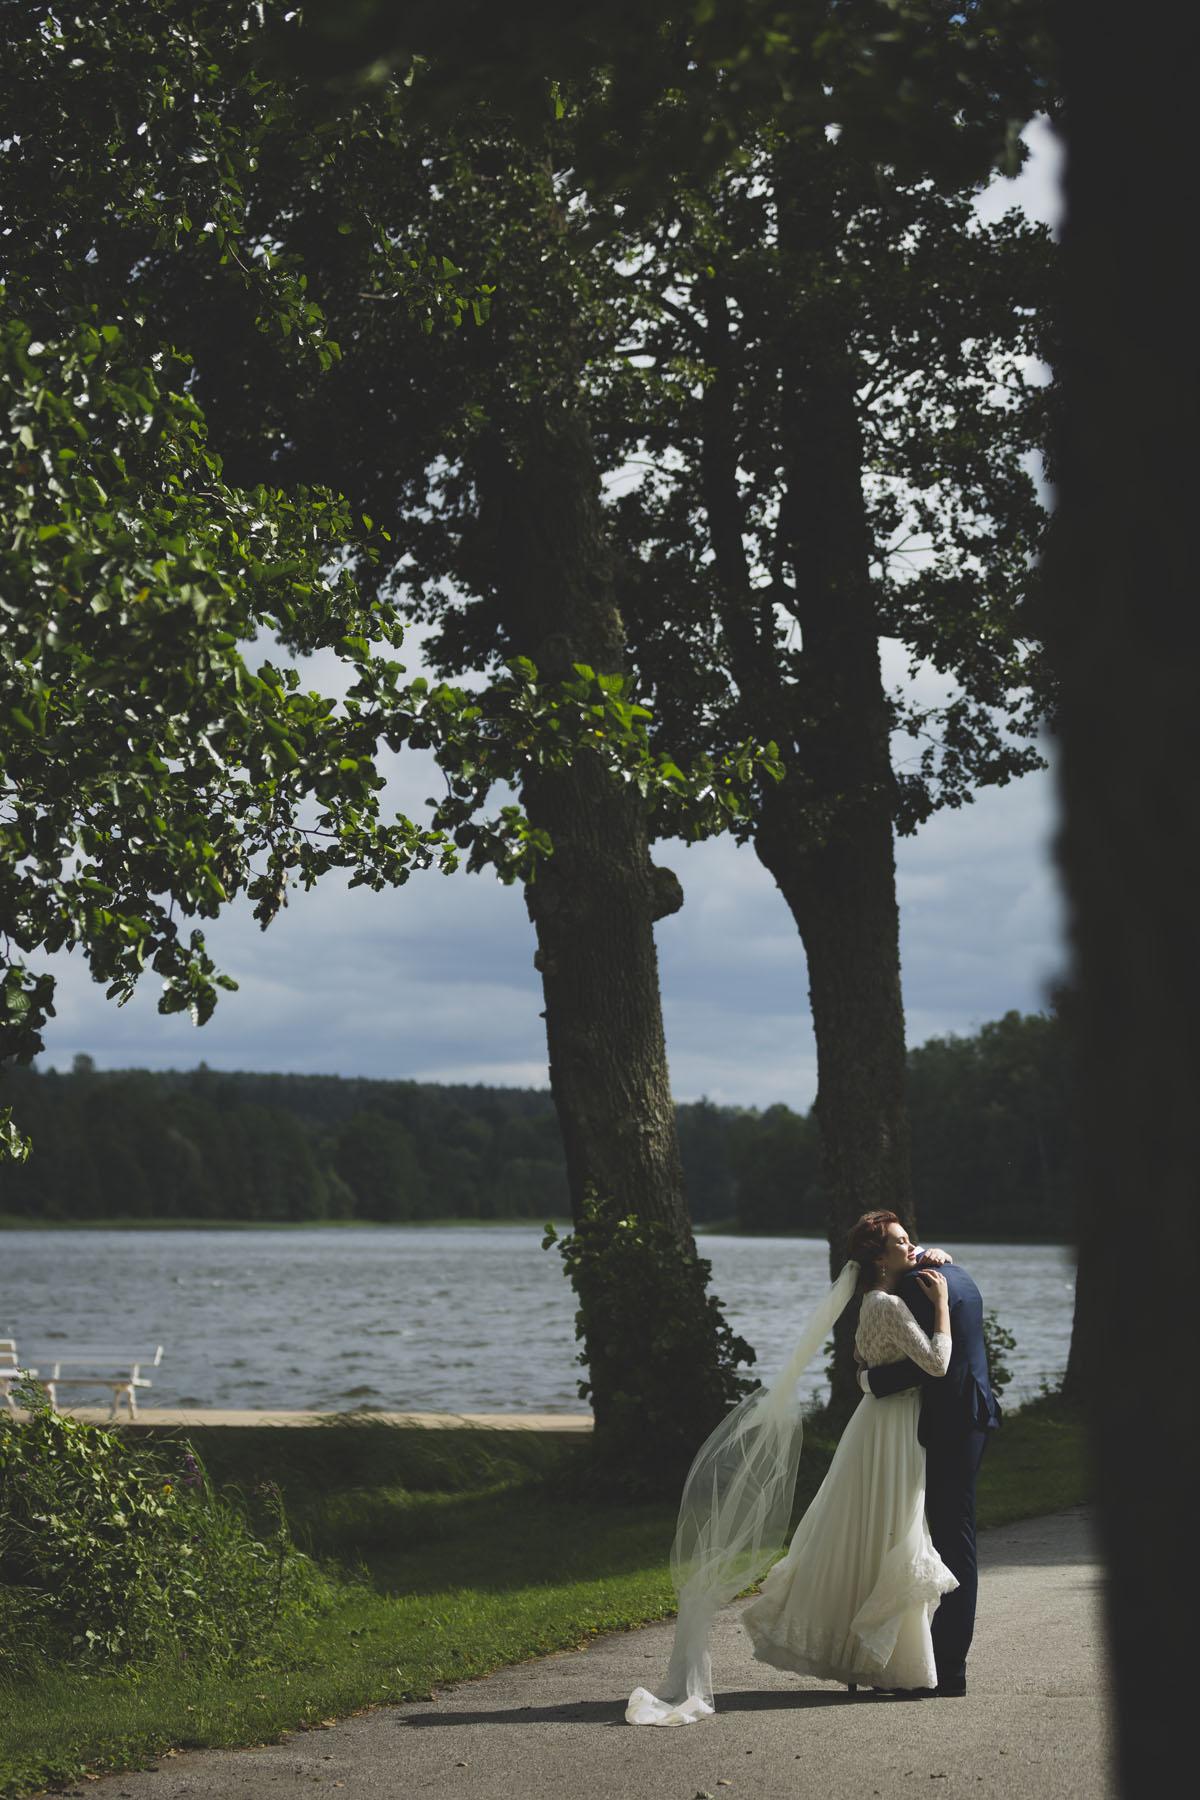 best-wedding-photos-104-wedding-in-estonia.jpg